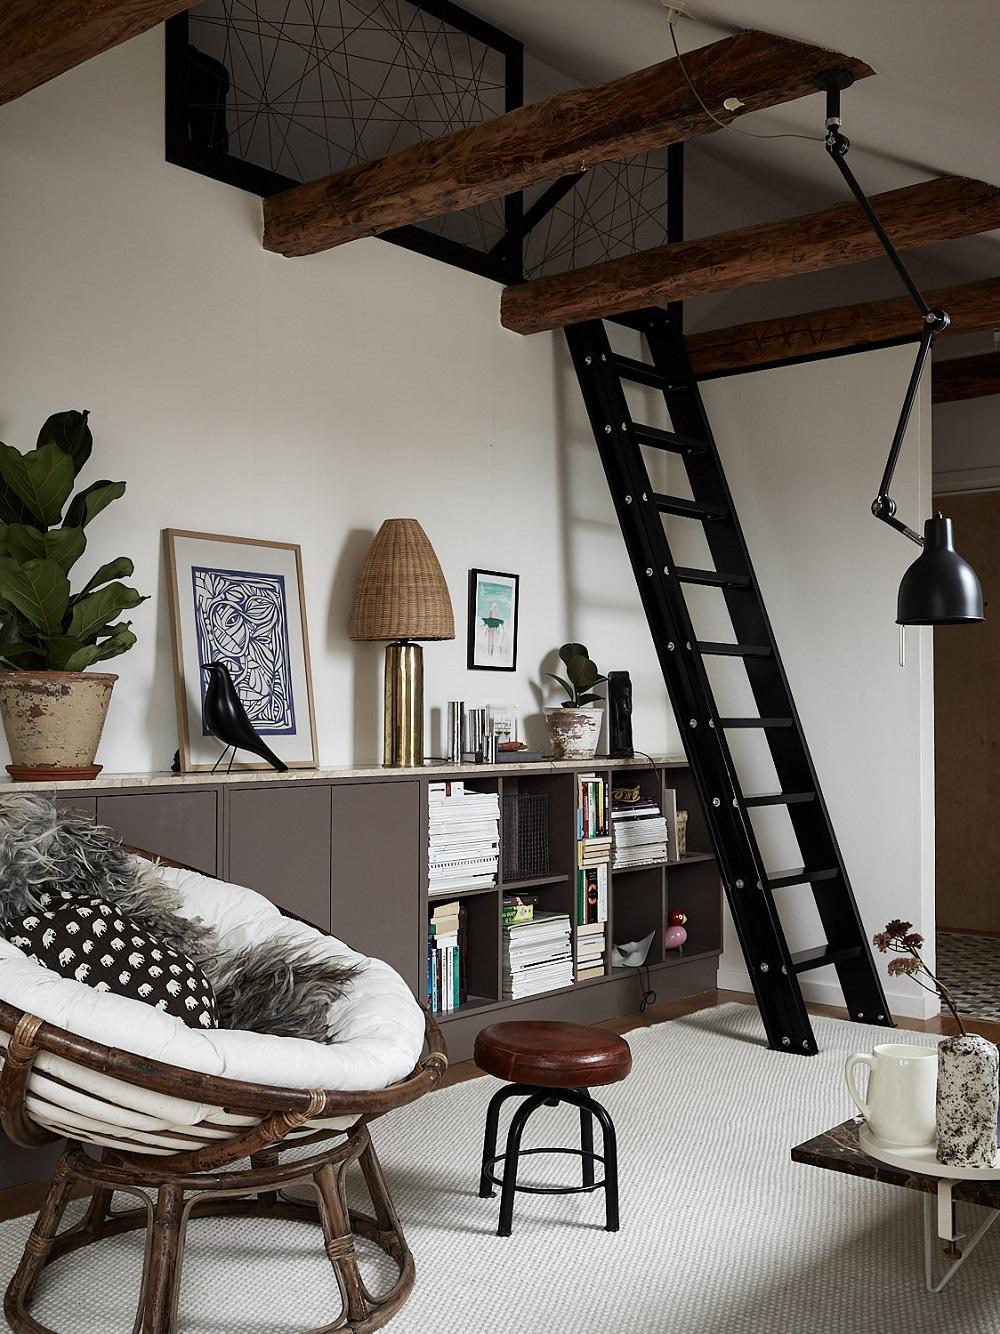 An amazing Scandinavian attic living room